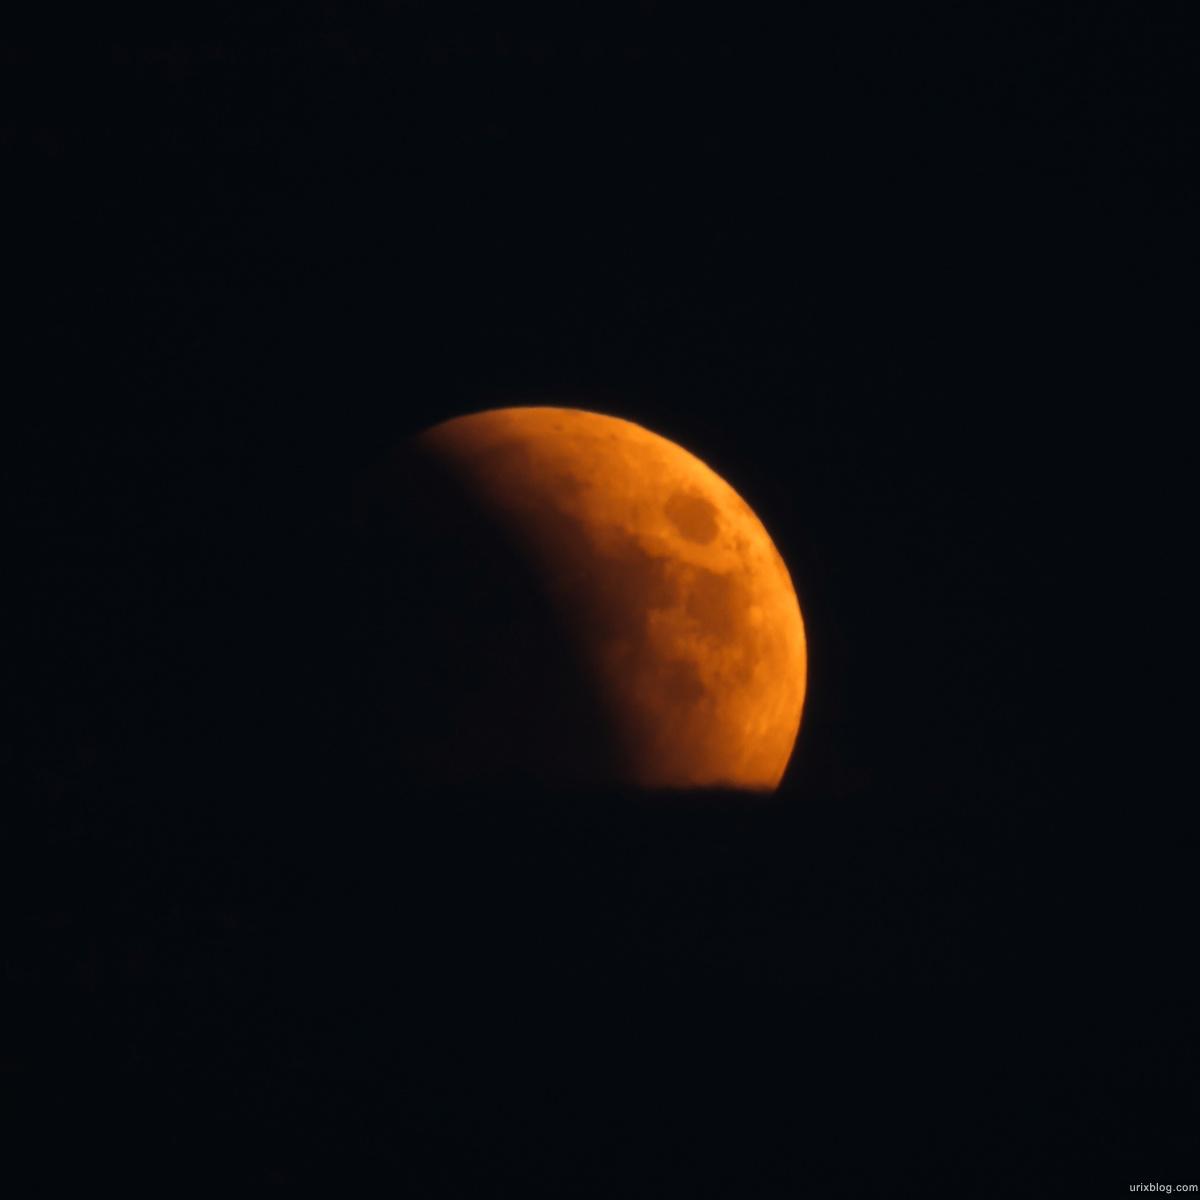 Lunar eclipse 2011.06.15, Лунное затмение, Moscow, Москва, объектив Samyang 800mm Moon